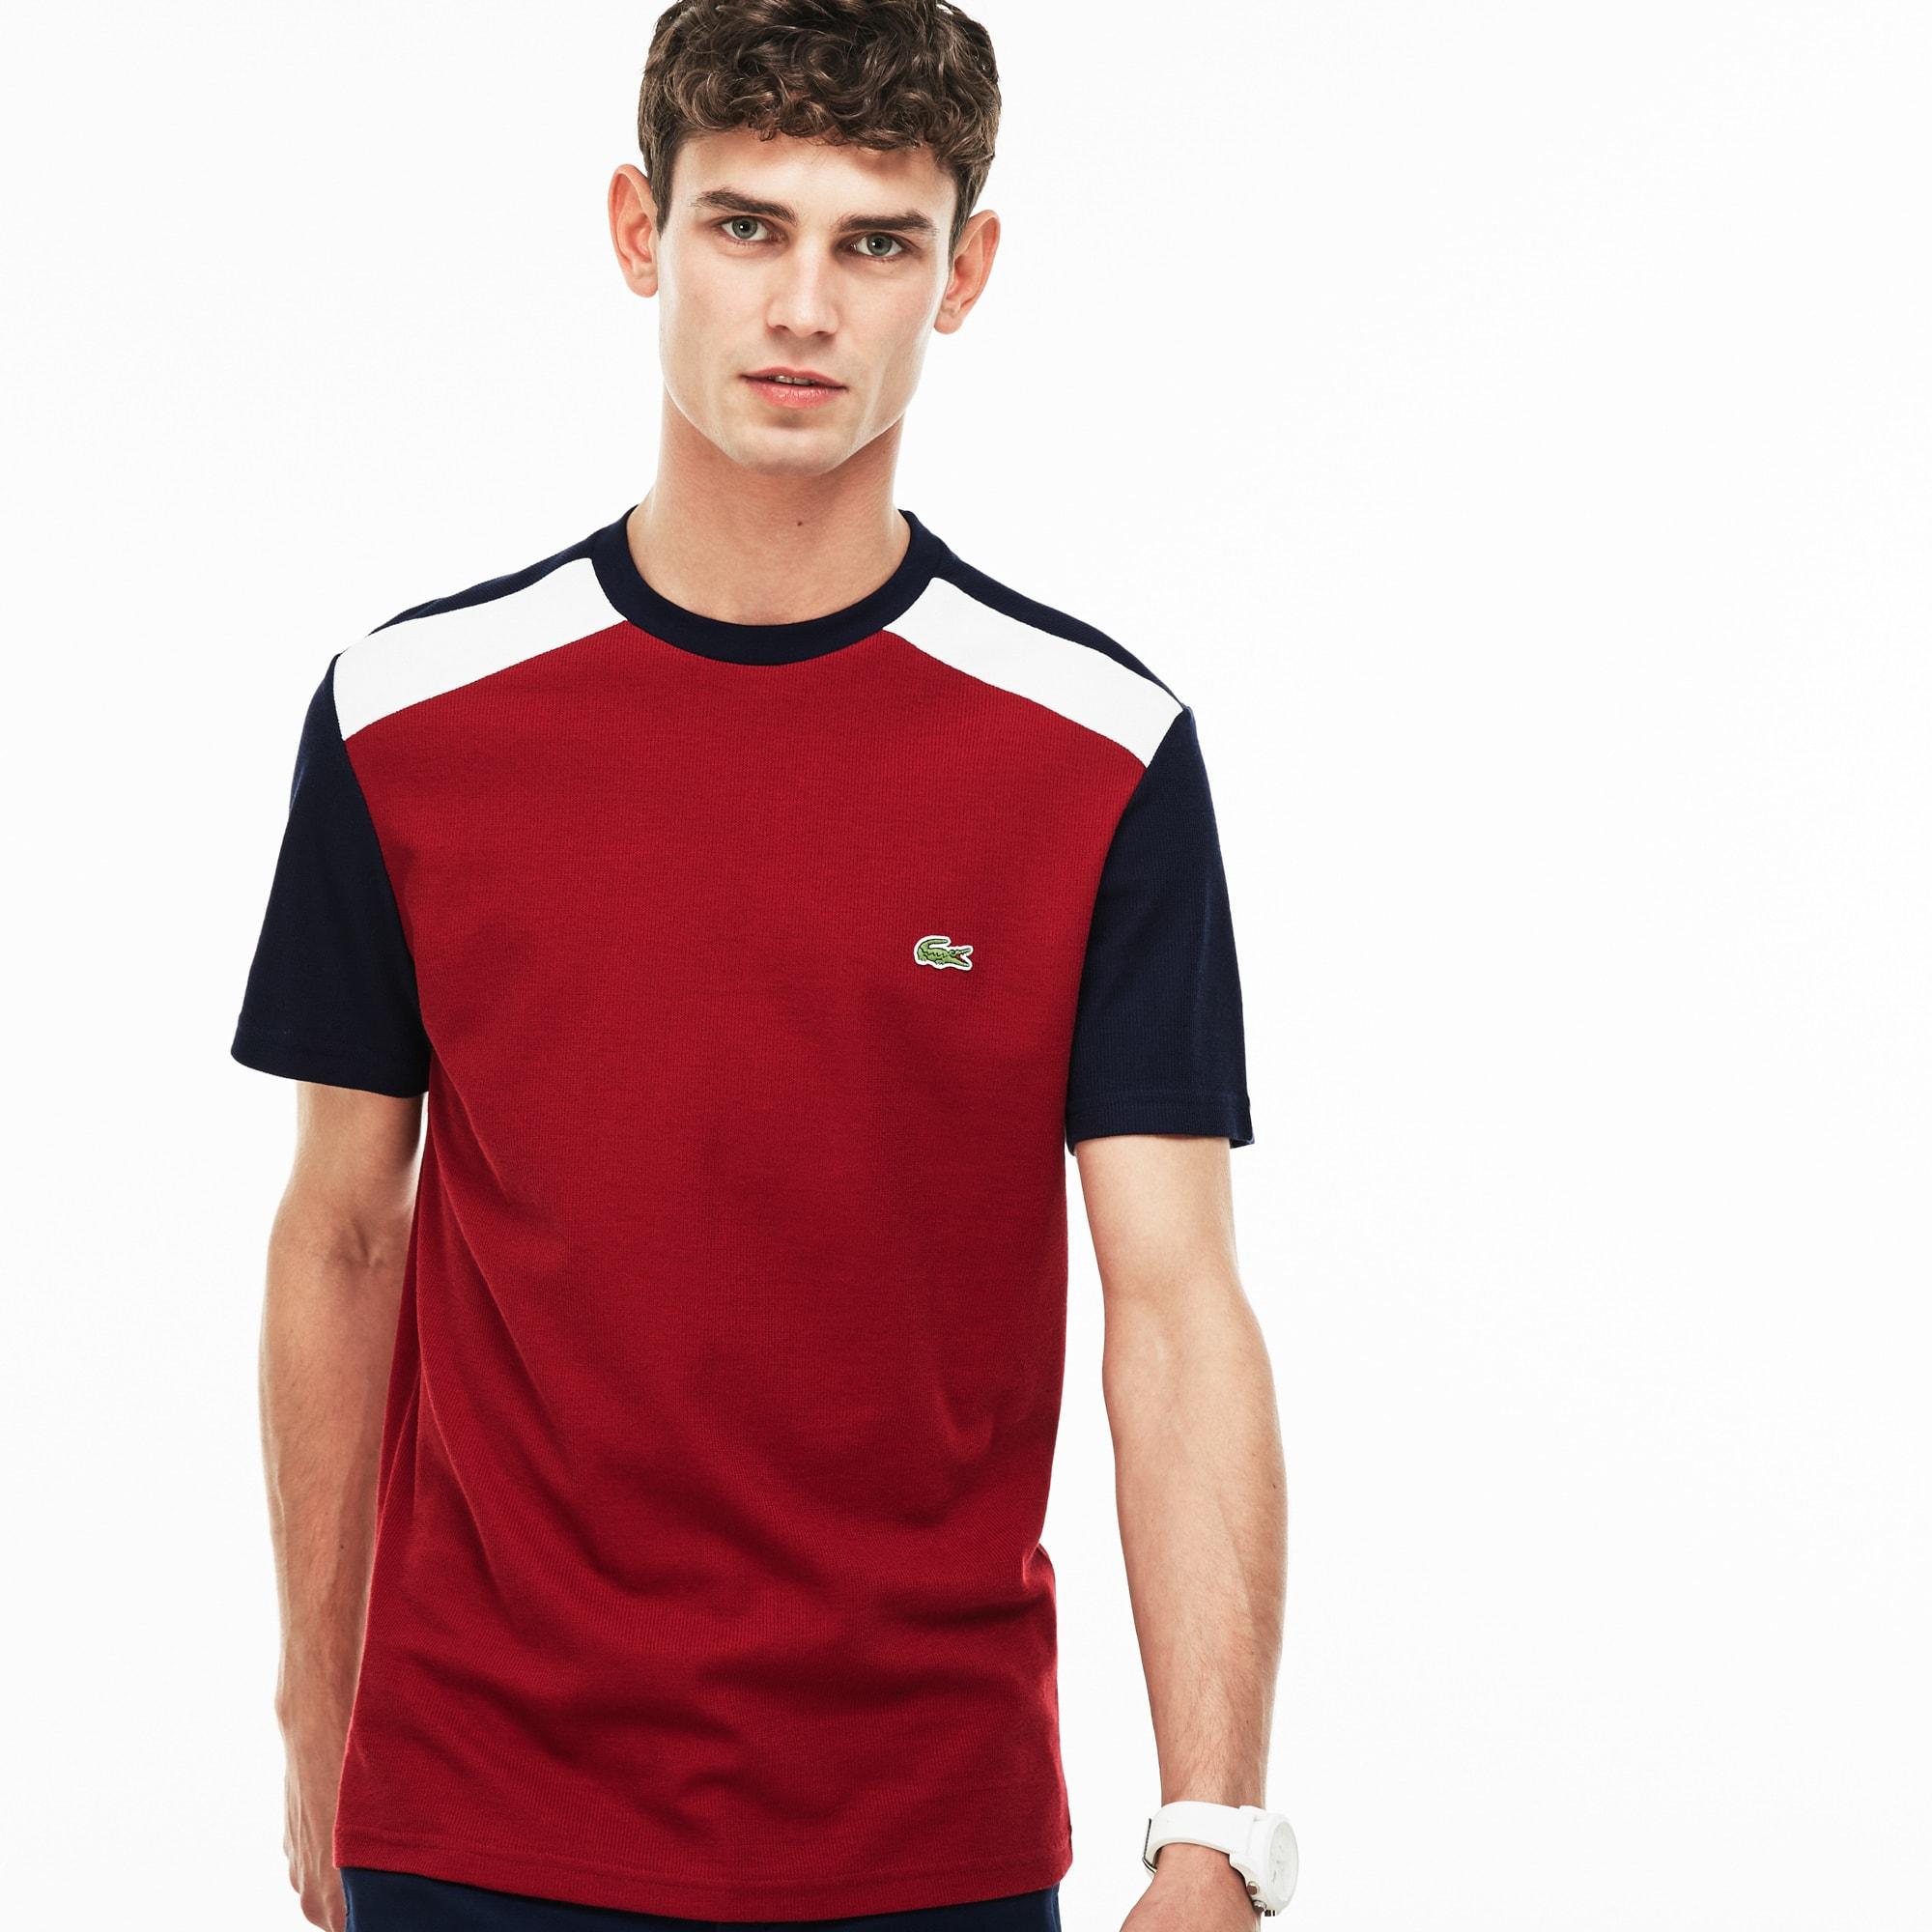 Men's Crew Neck Colorblock Jersey And Piqué T-shirt